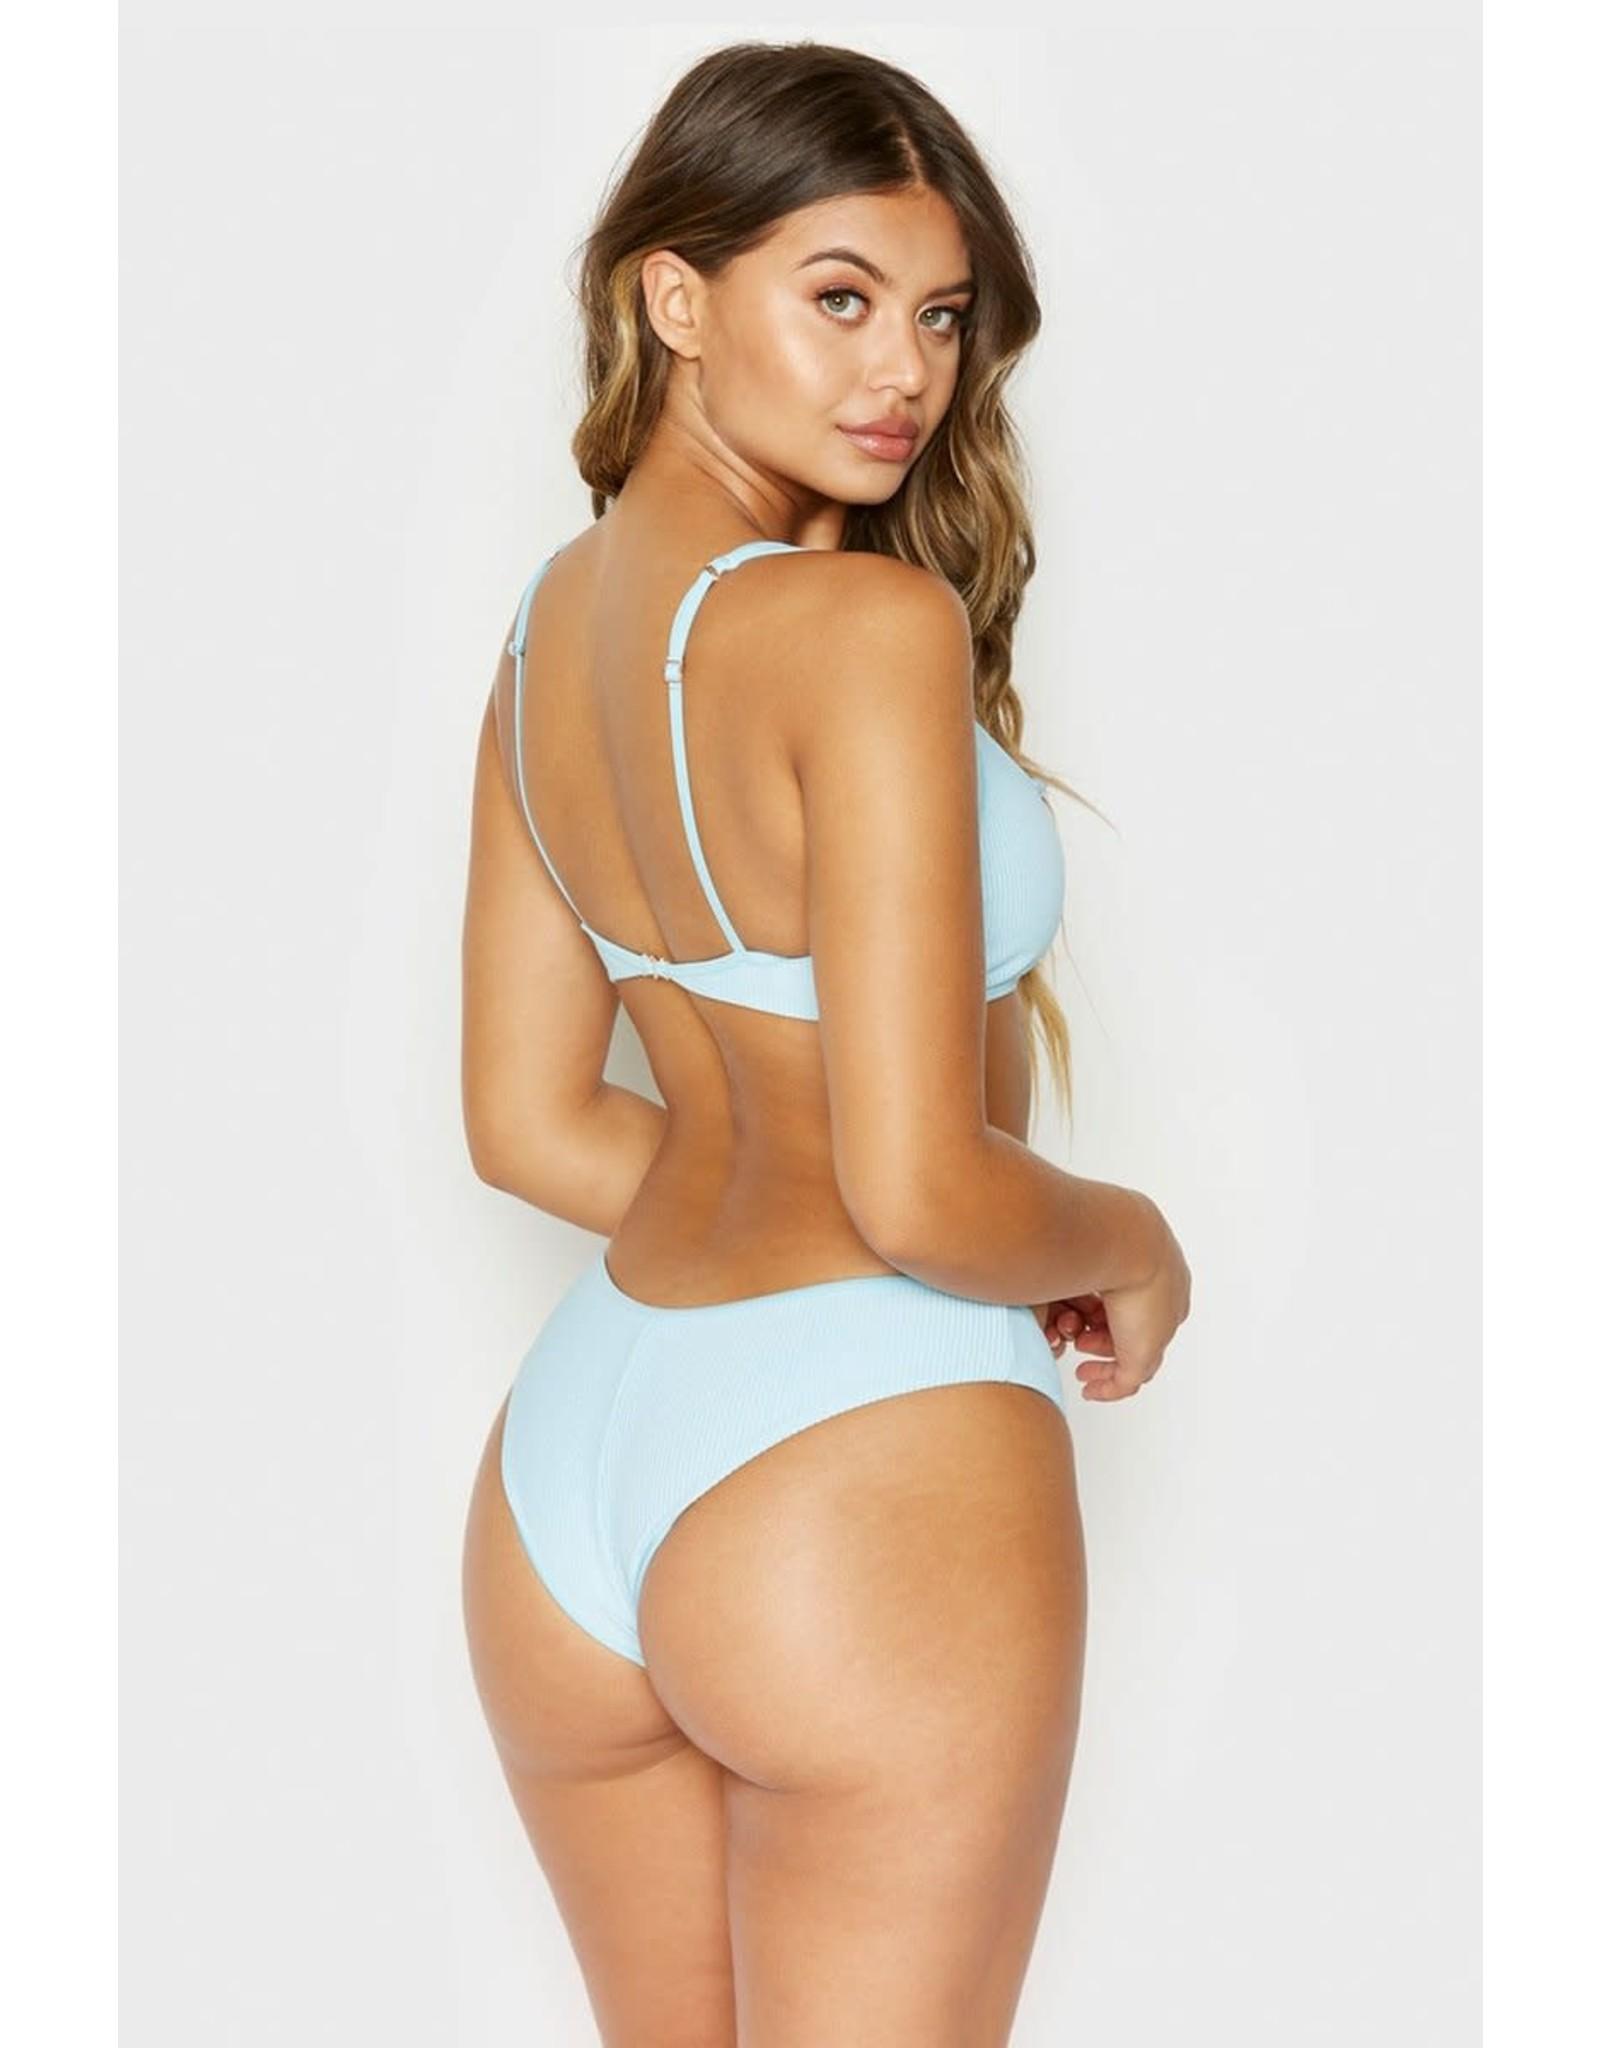 Frankies Alana Bottom